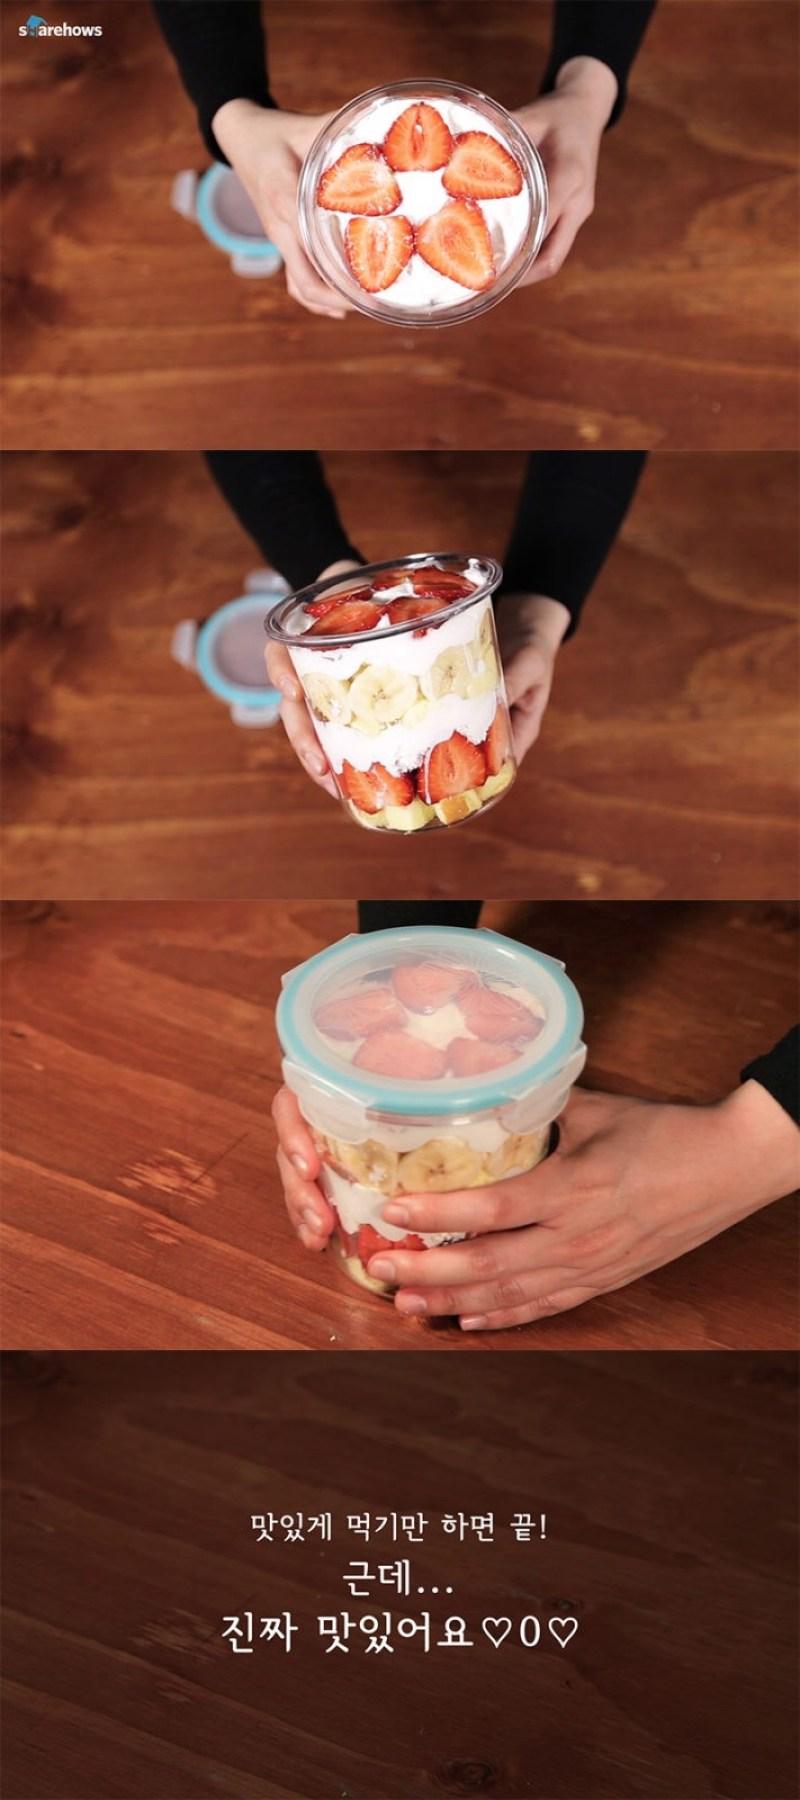 how-to-make-bottle-cake 02